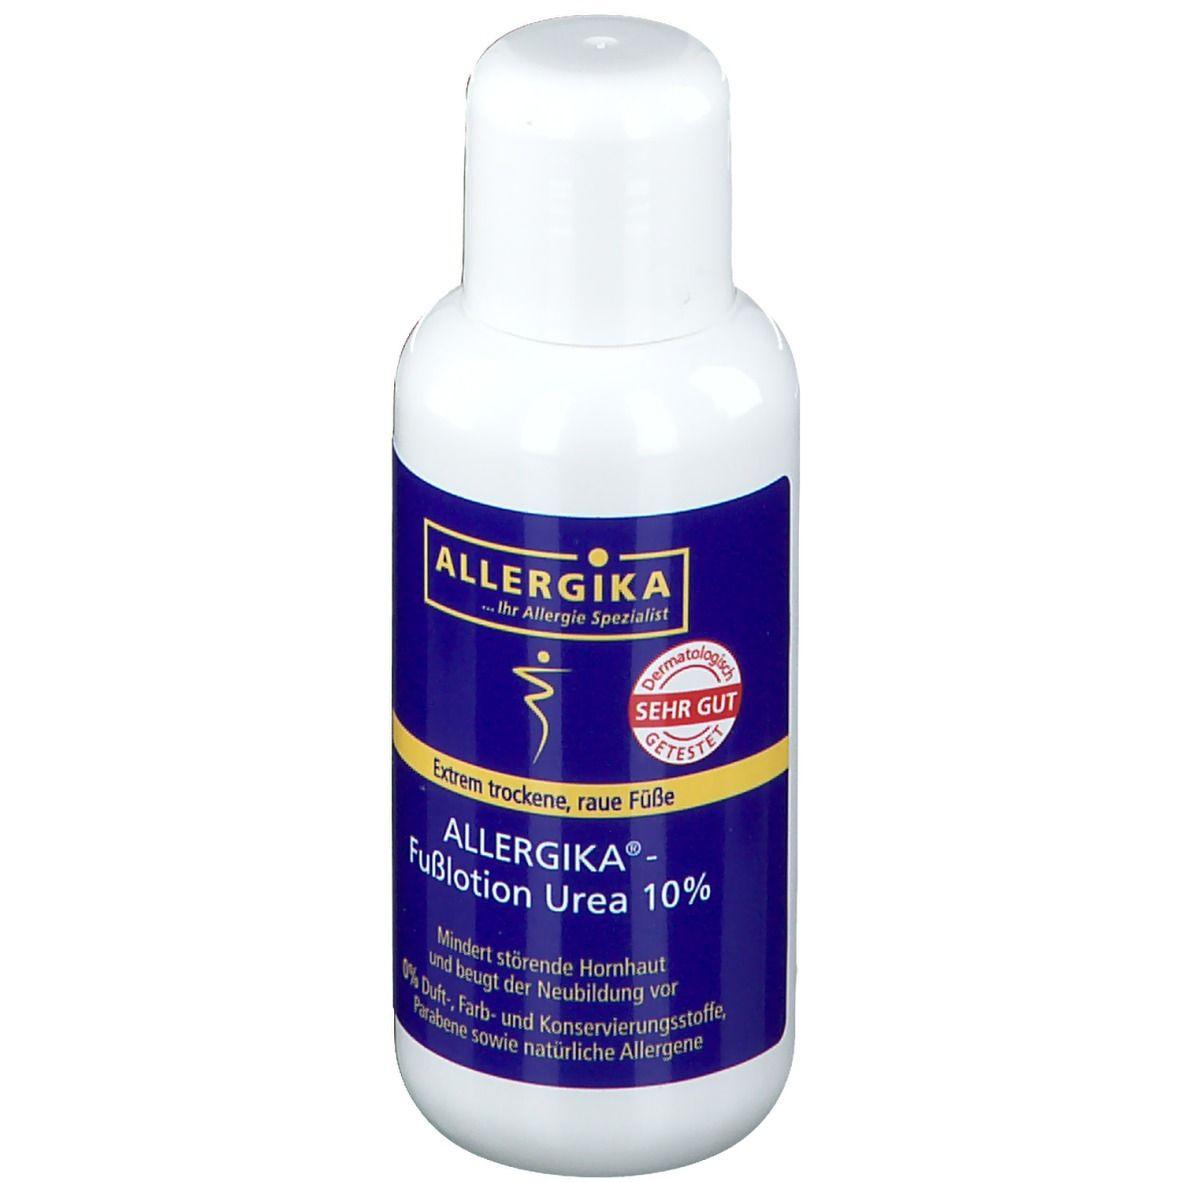 ALLERGIKA®-Fußlotion Urea 10%